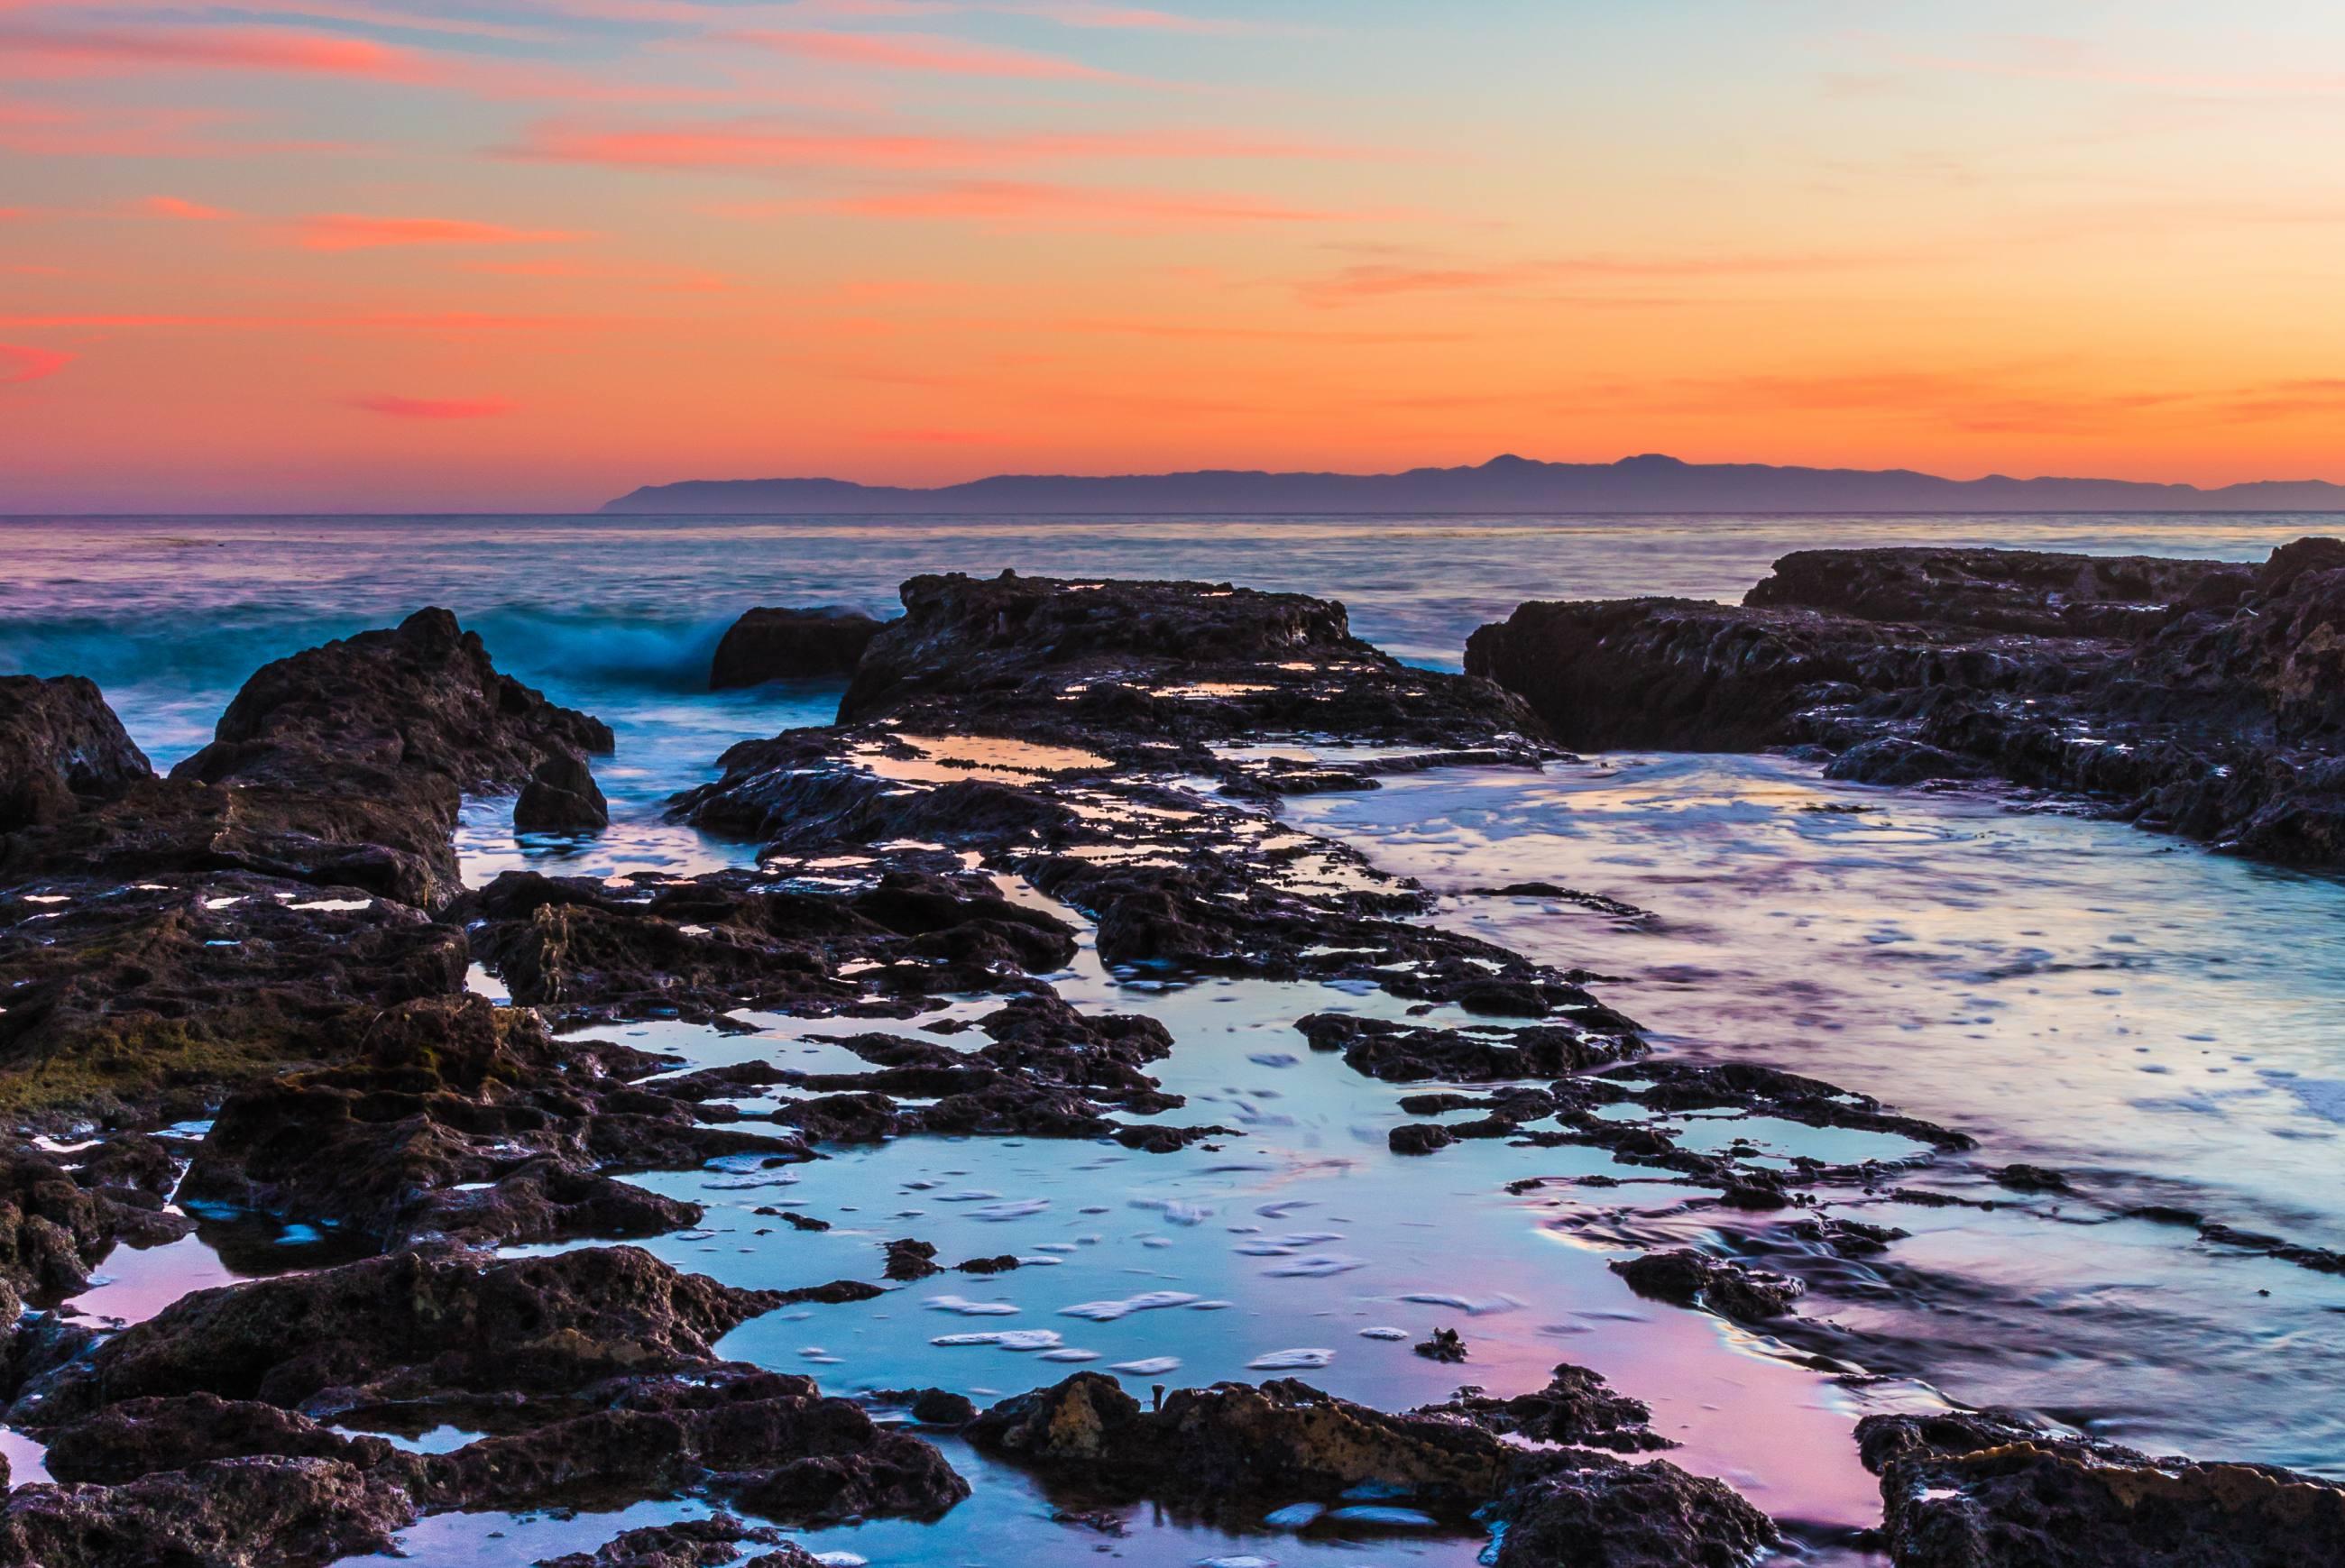 White Point Beach at sunset